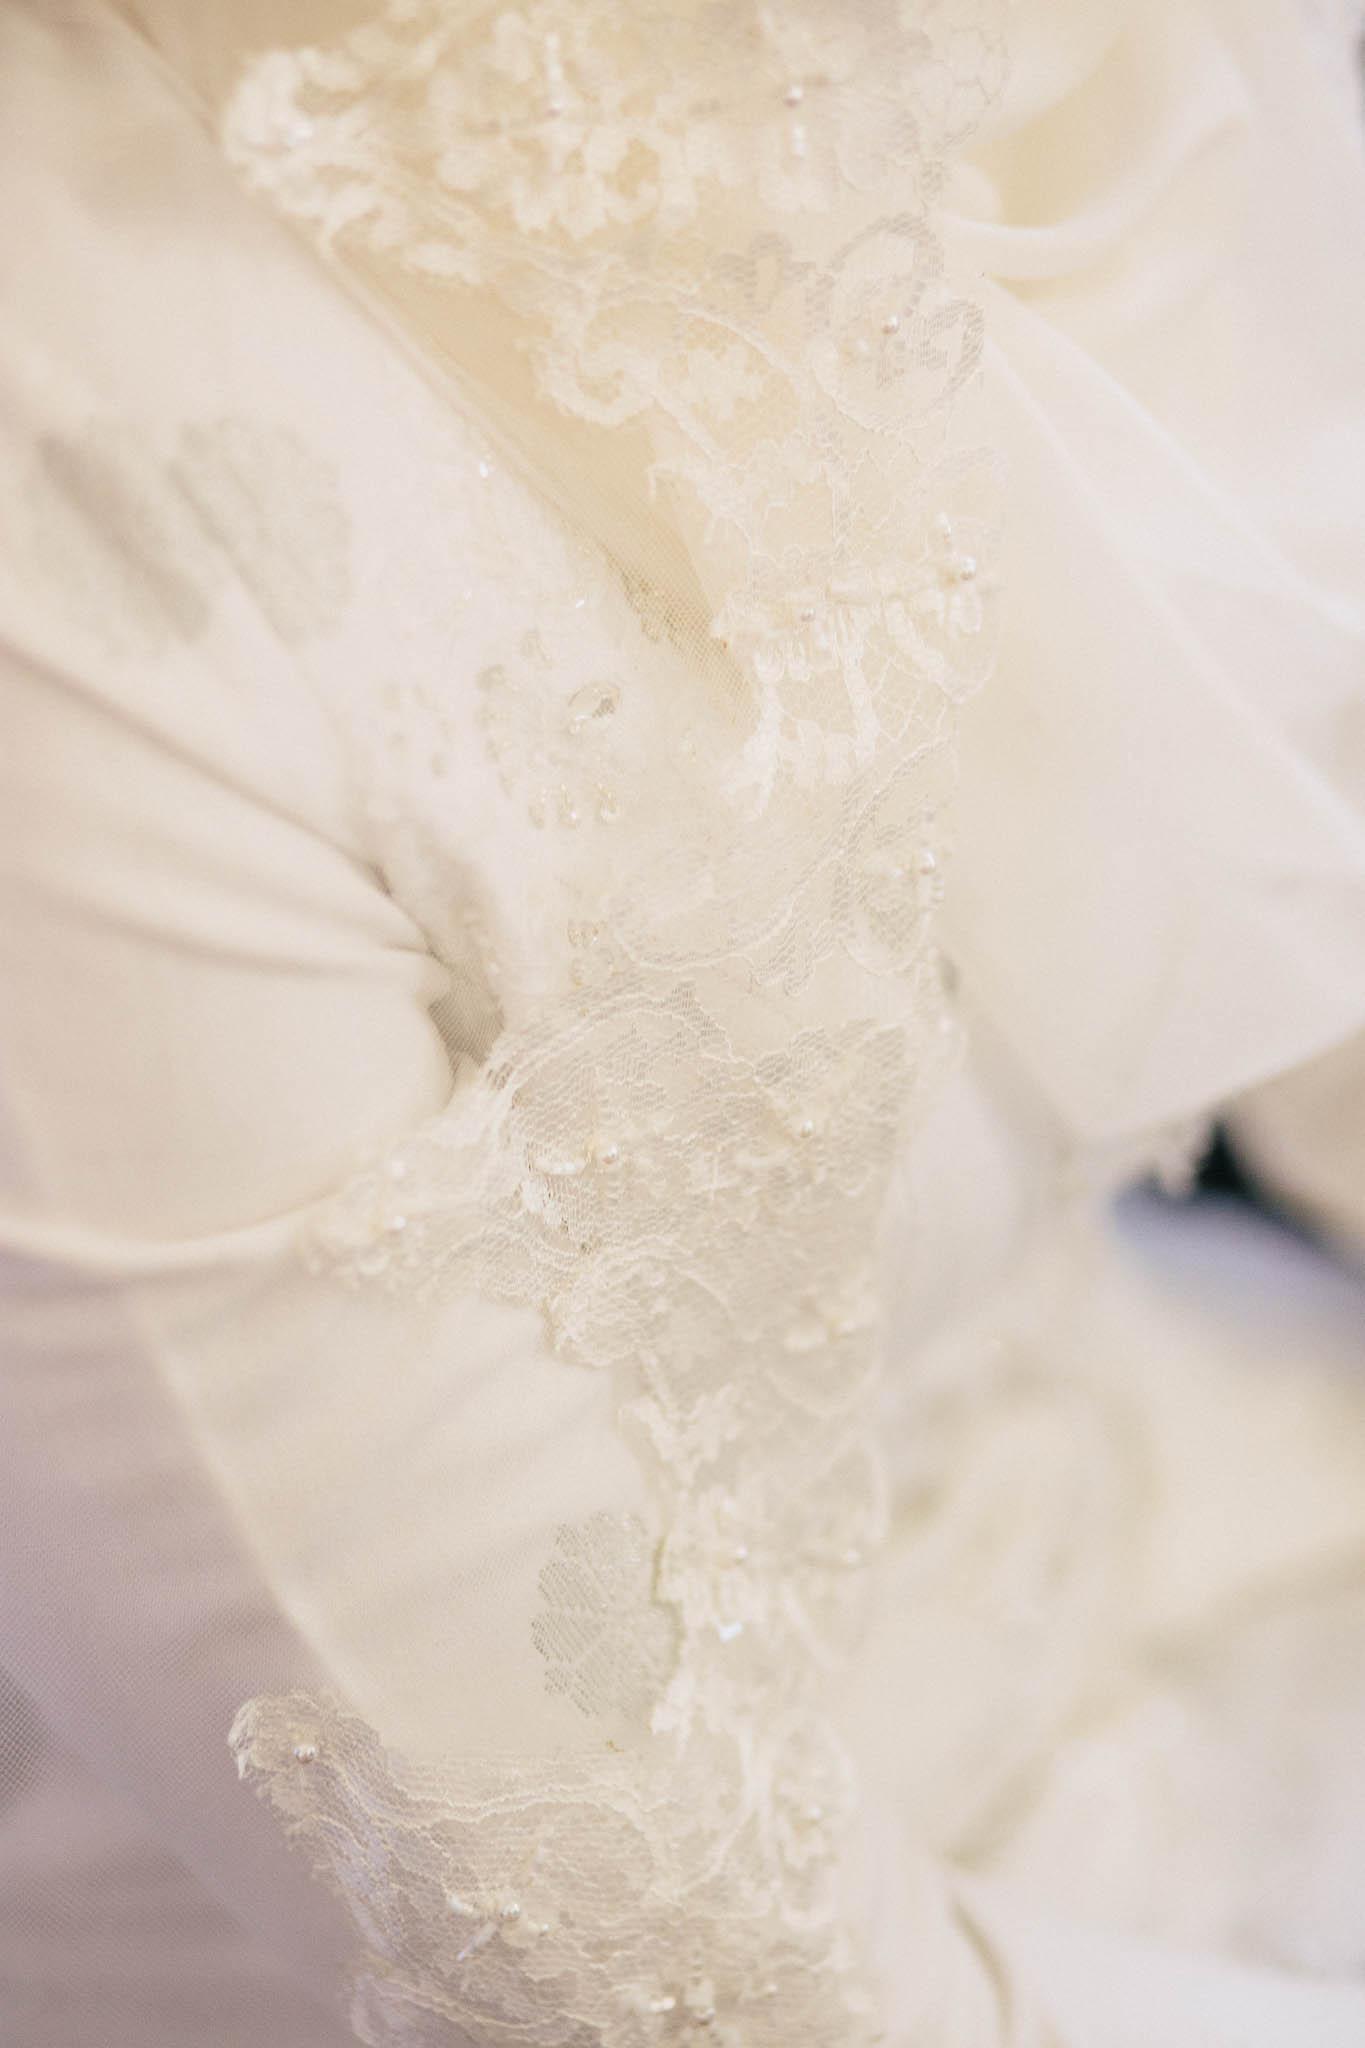 singapore-wedding-photographer-malay-indian-pre-wedding-travel-wmt-2015-shereen-farid-08.jpg